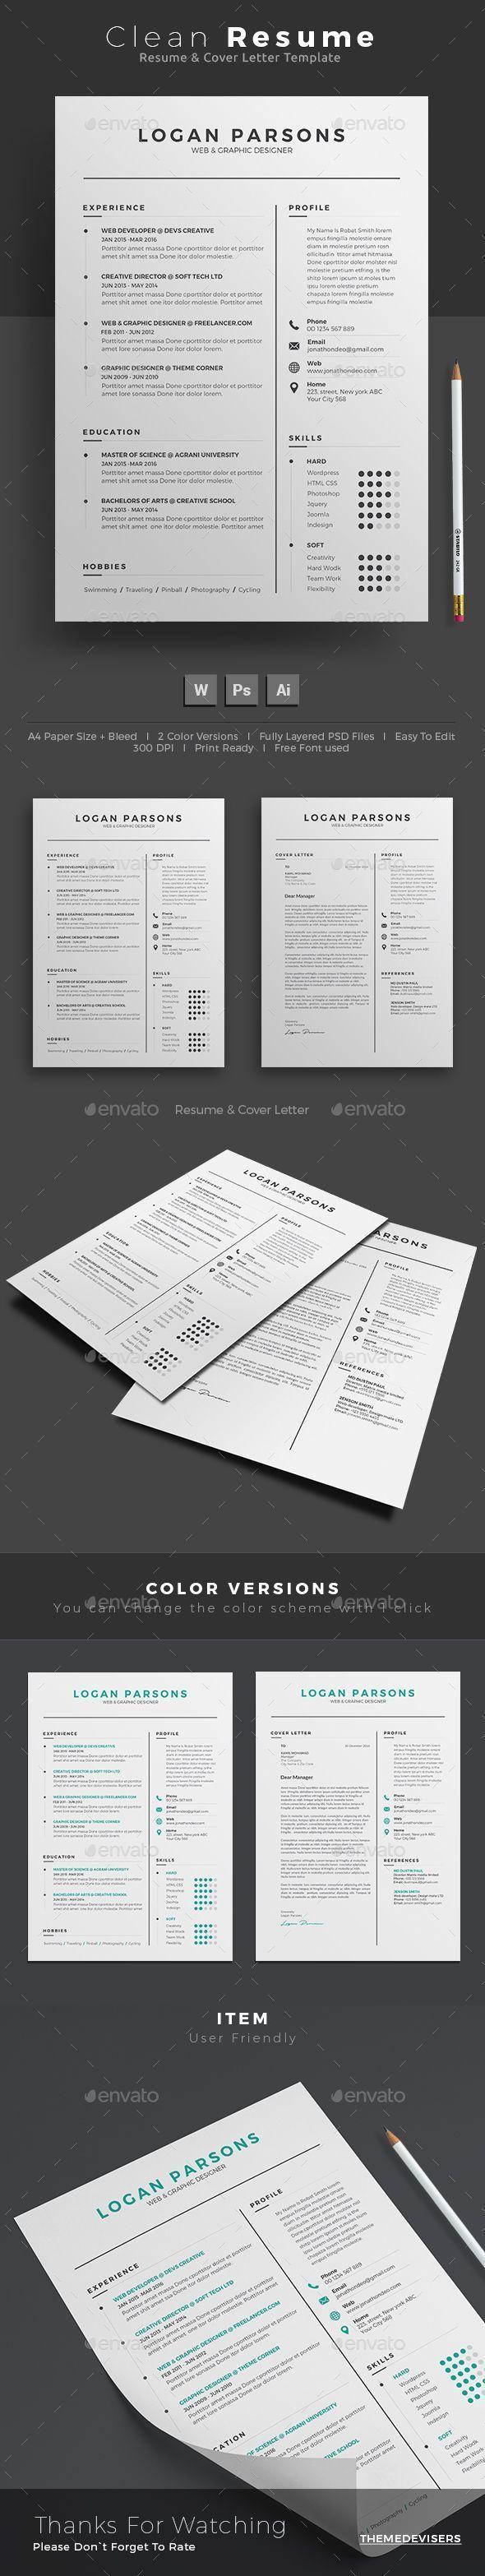 Resume Template PSD AI Illustrator MS Word